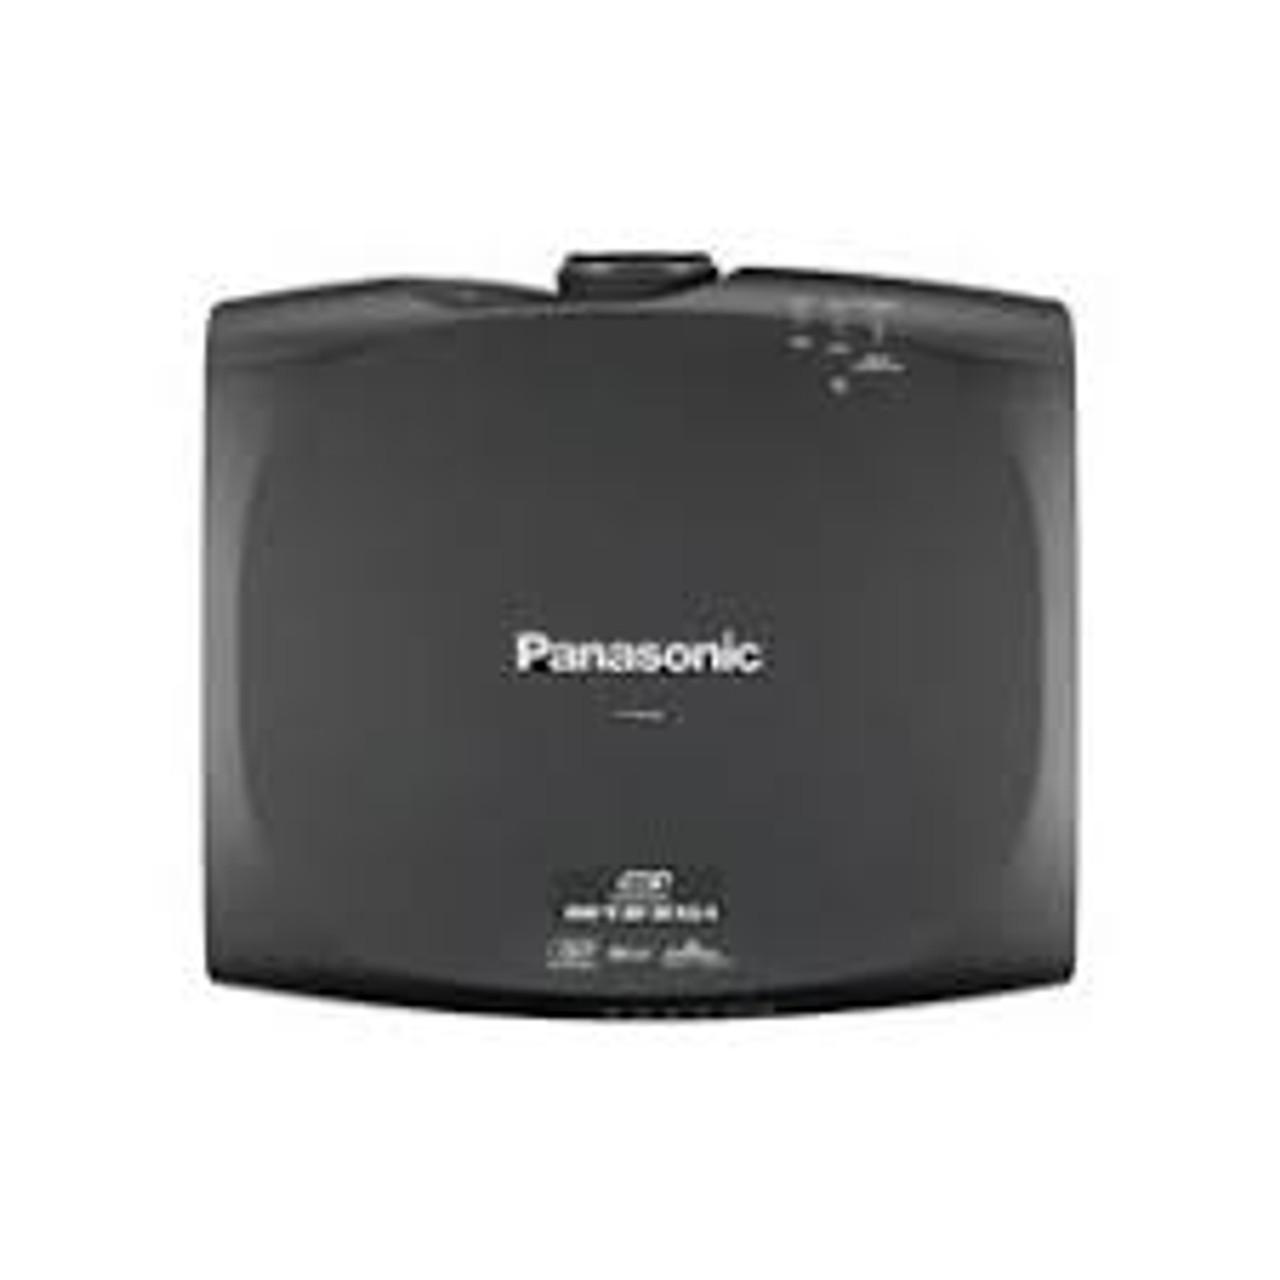 Panasonic PT-RW430U 1-Chip DLP™ Laser Projector